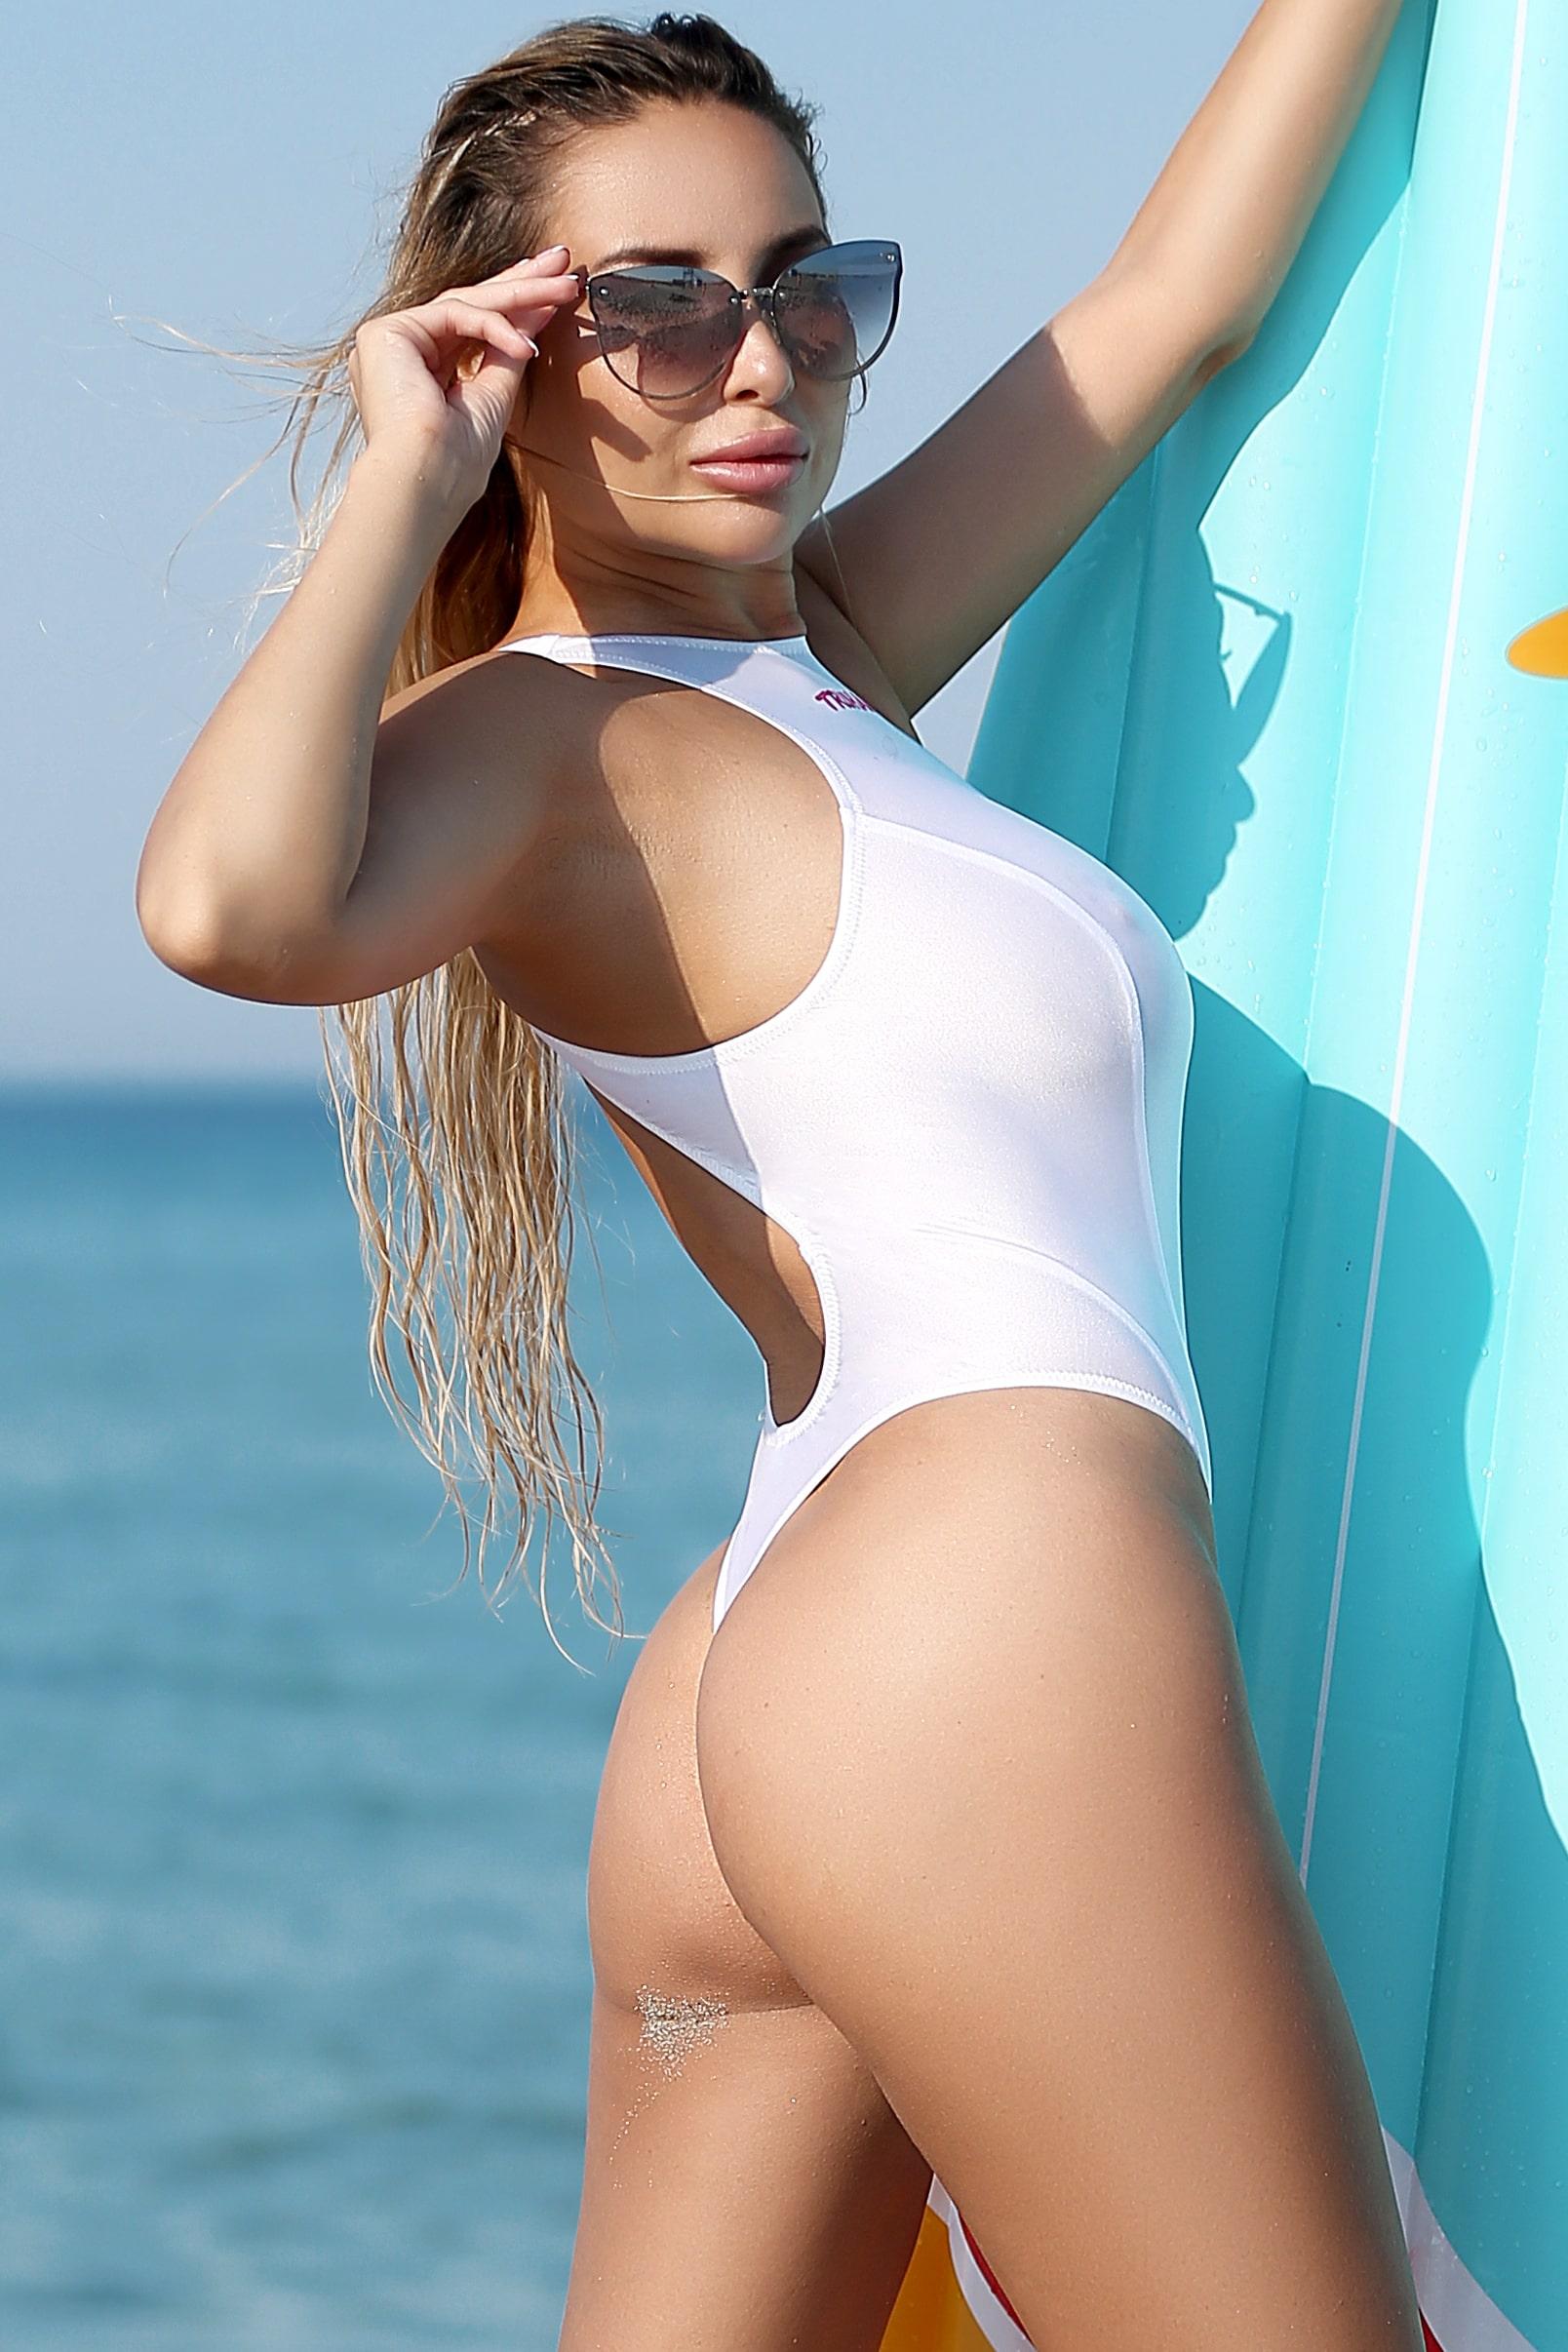 Sexy see through monokini thong swimsuit Cute sheer high neck one piece bathing suit Erotic white high leg bodysuit Designer womens swimwear